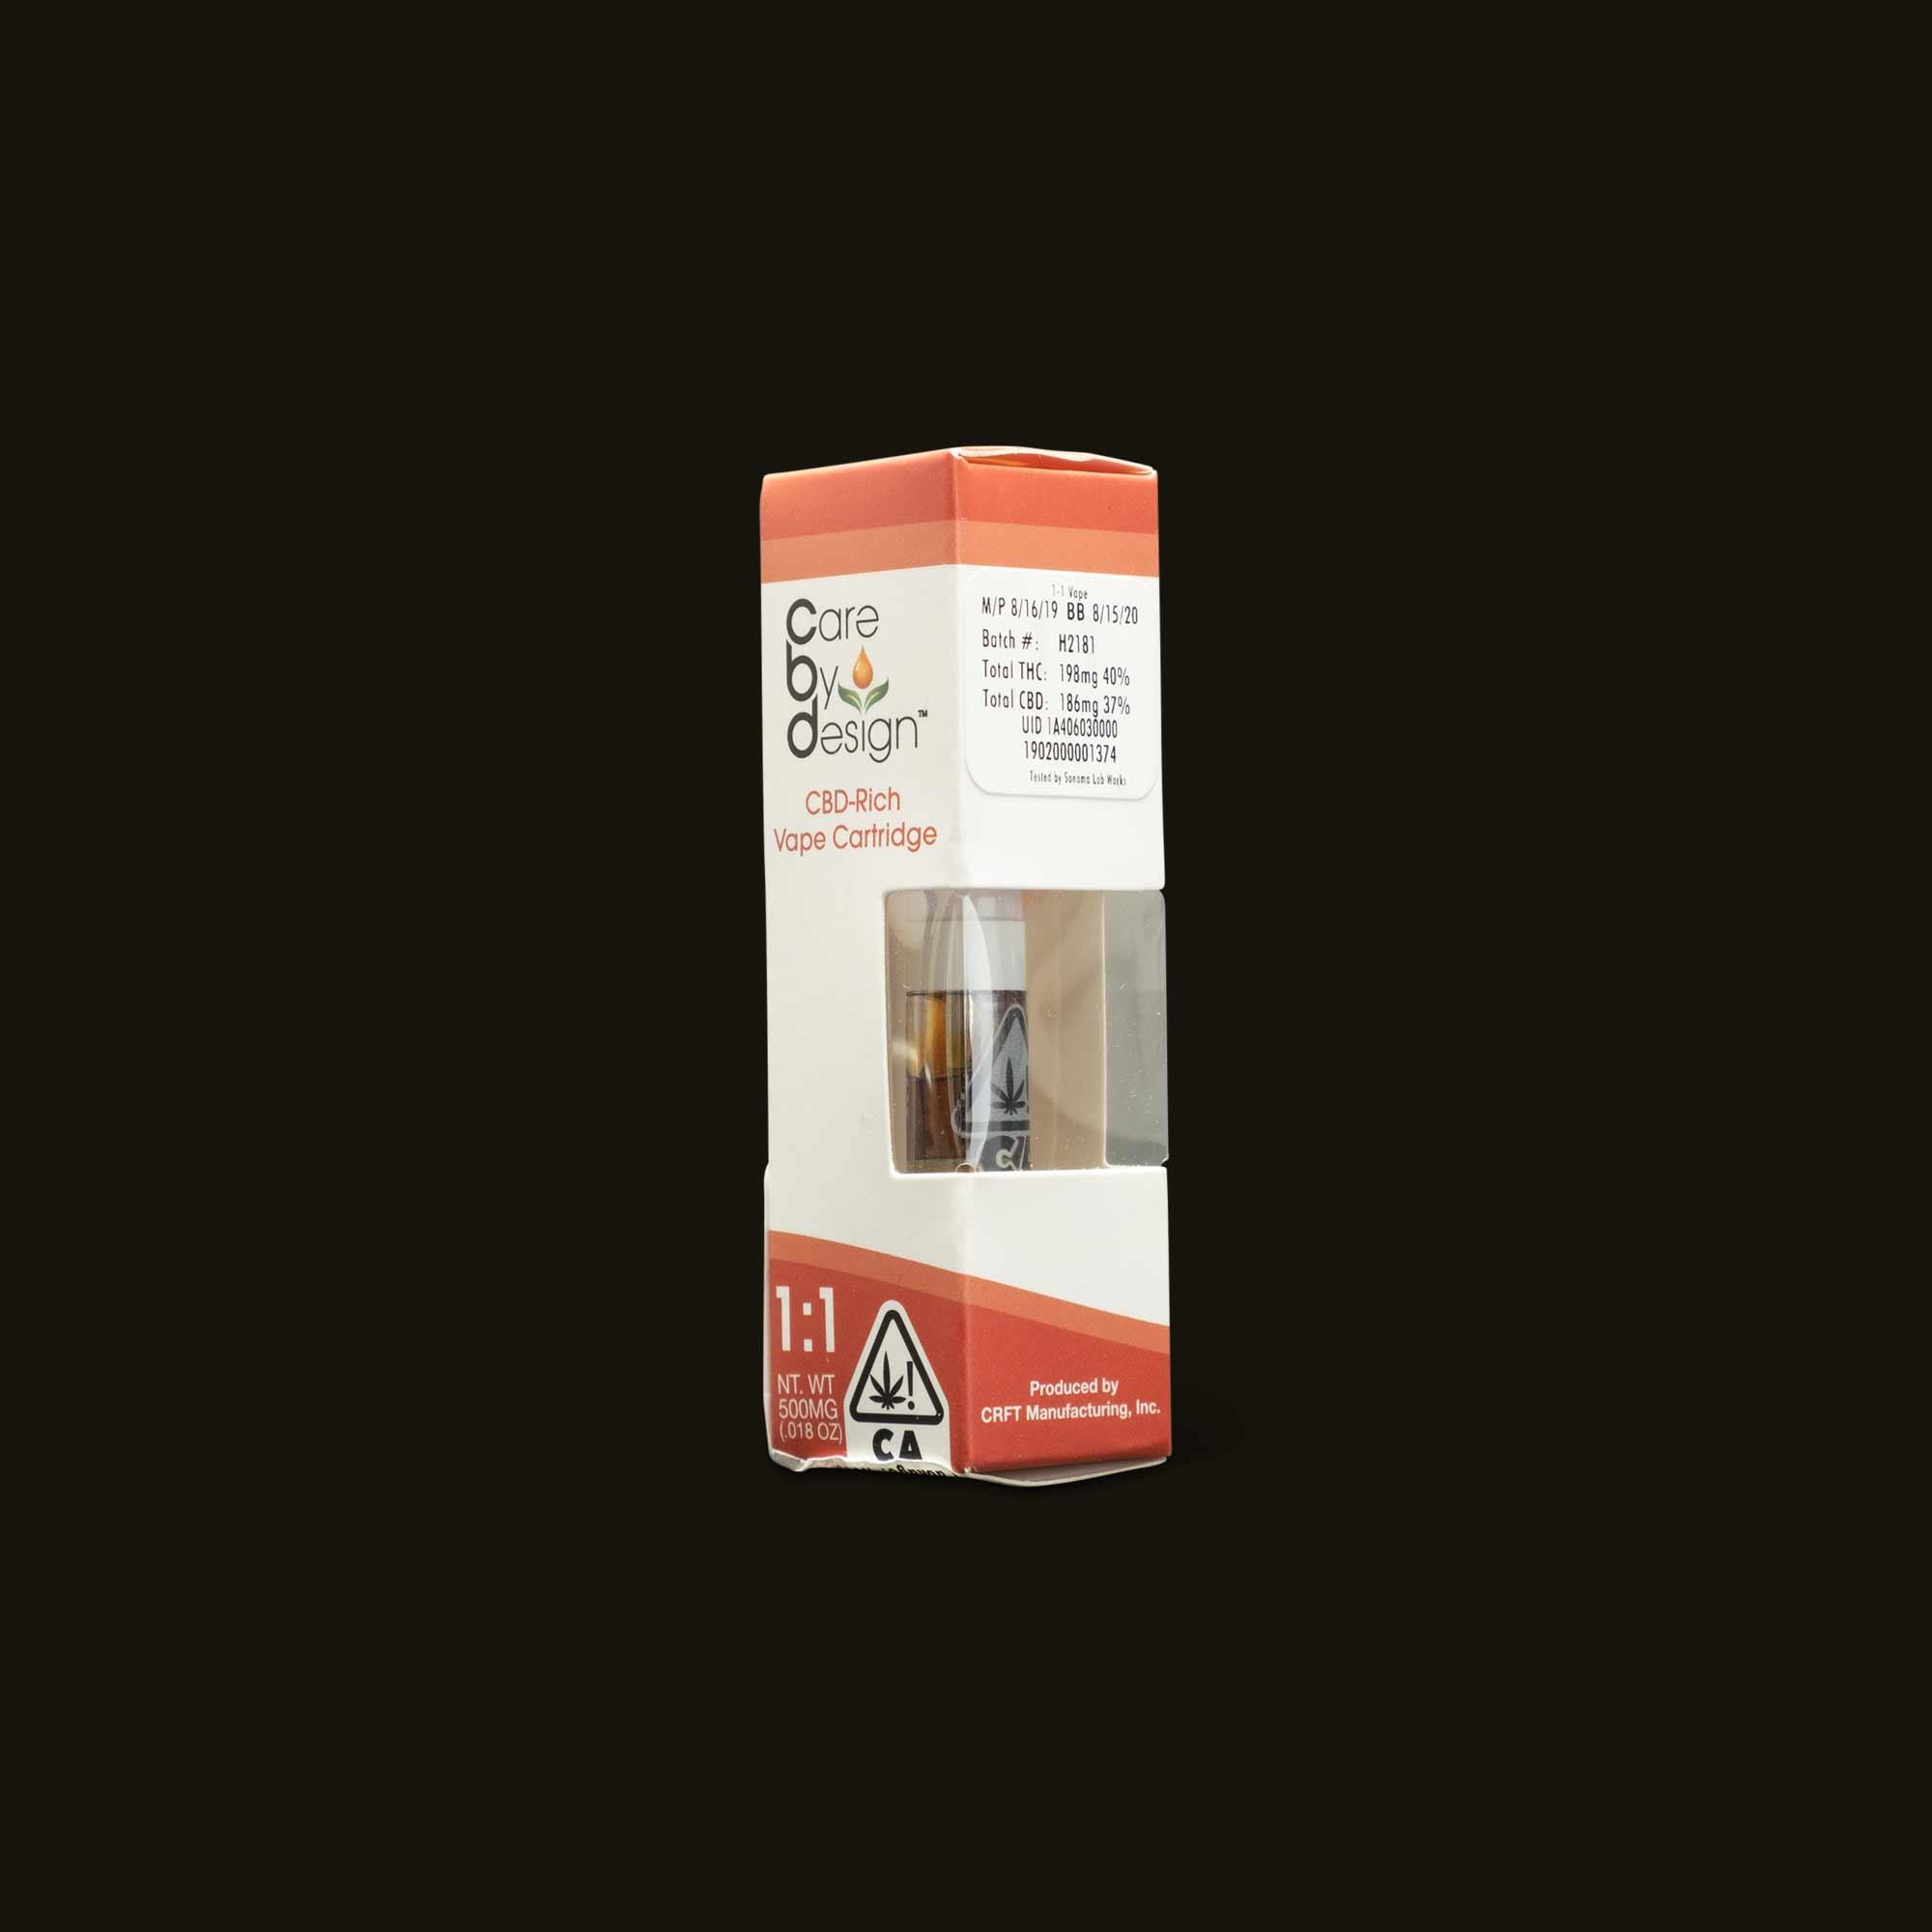 Care By Design 1:1 Vape Cartridge